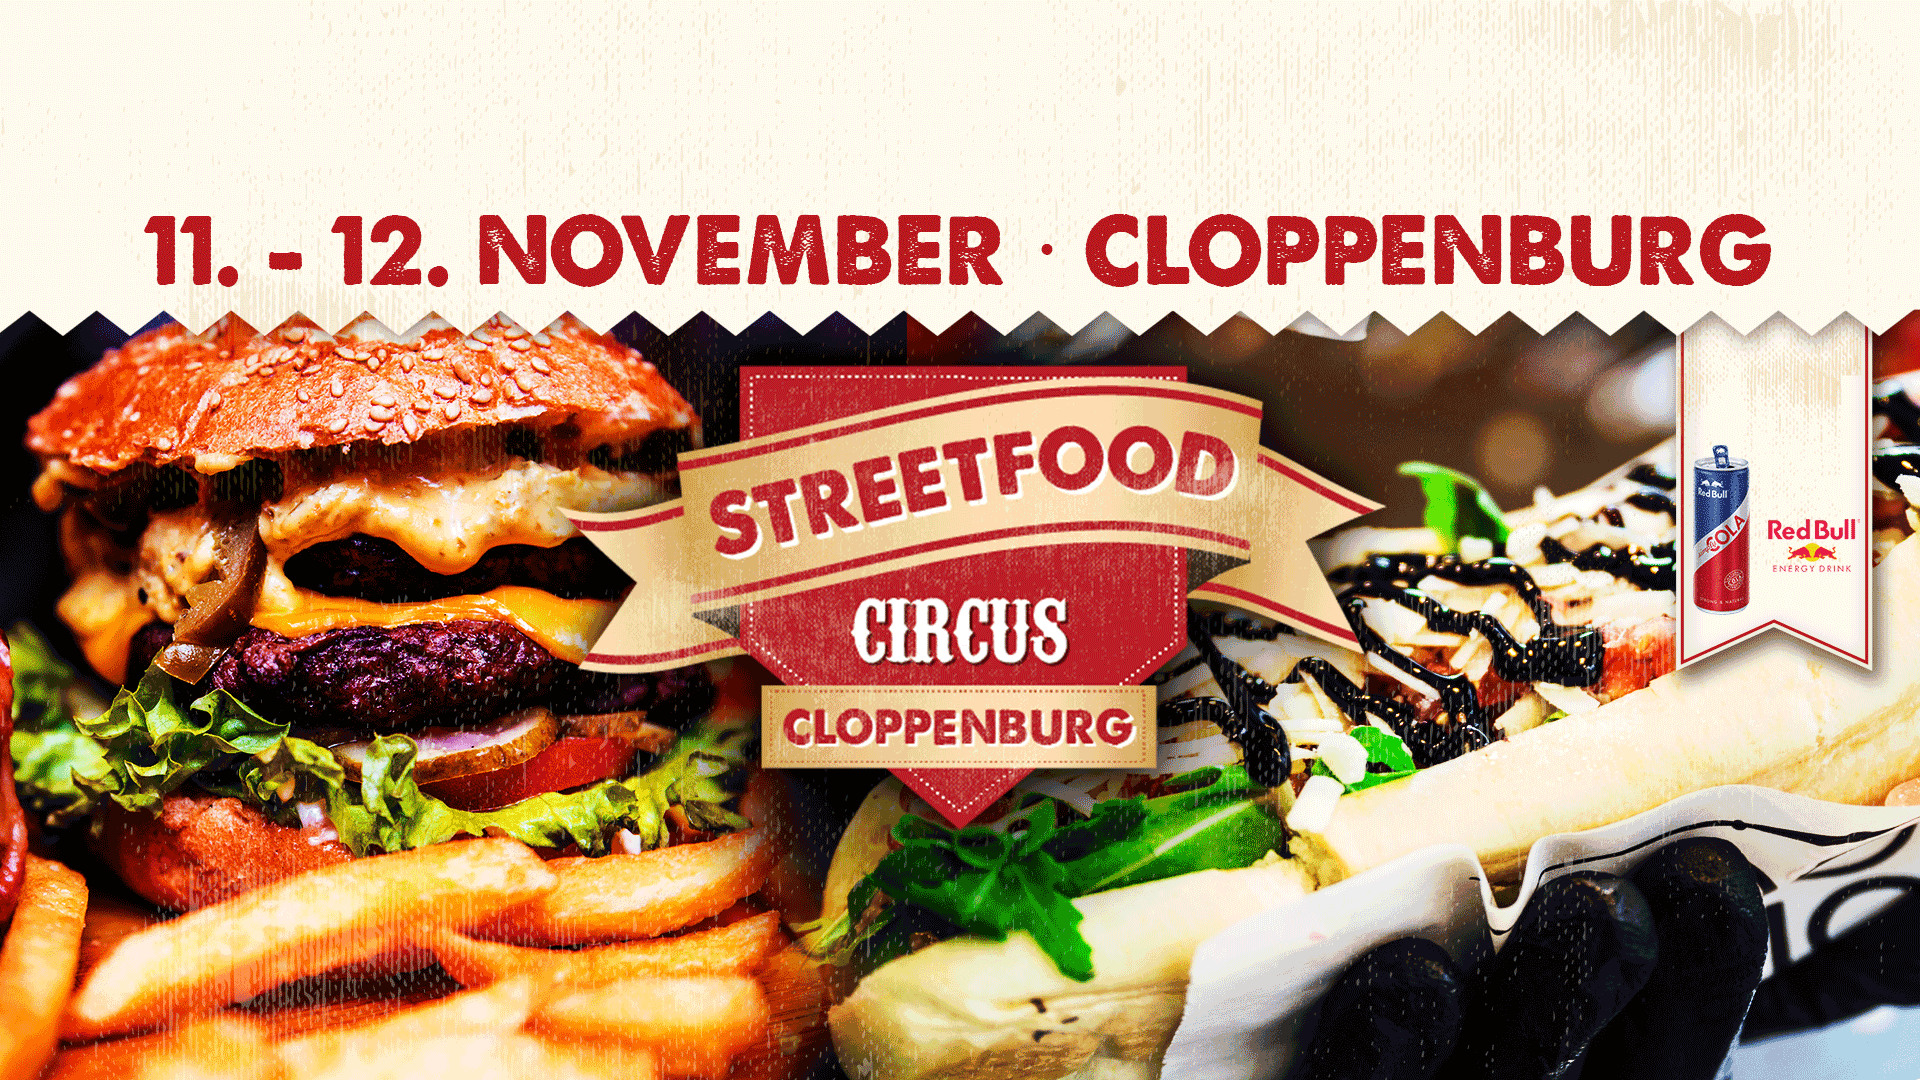 Streetfoodcircus Cloppenburg